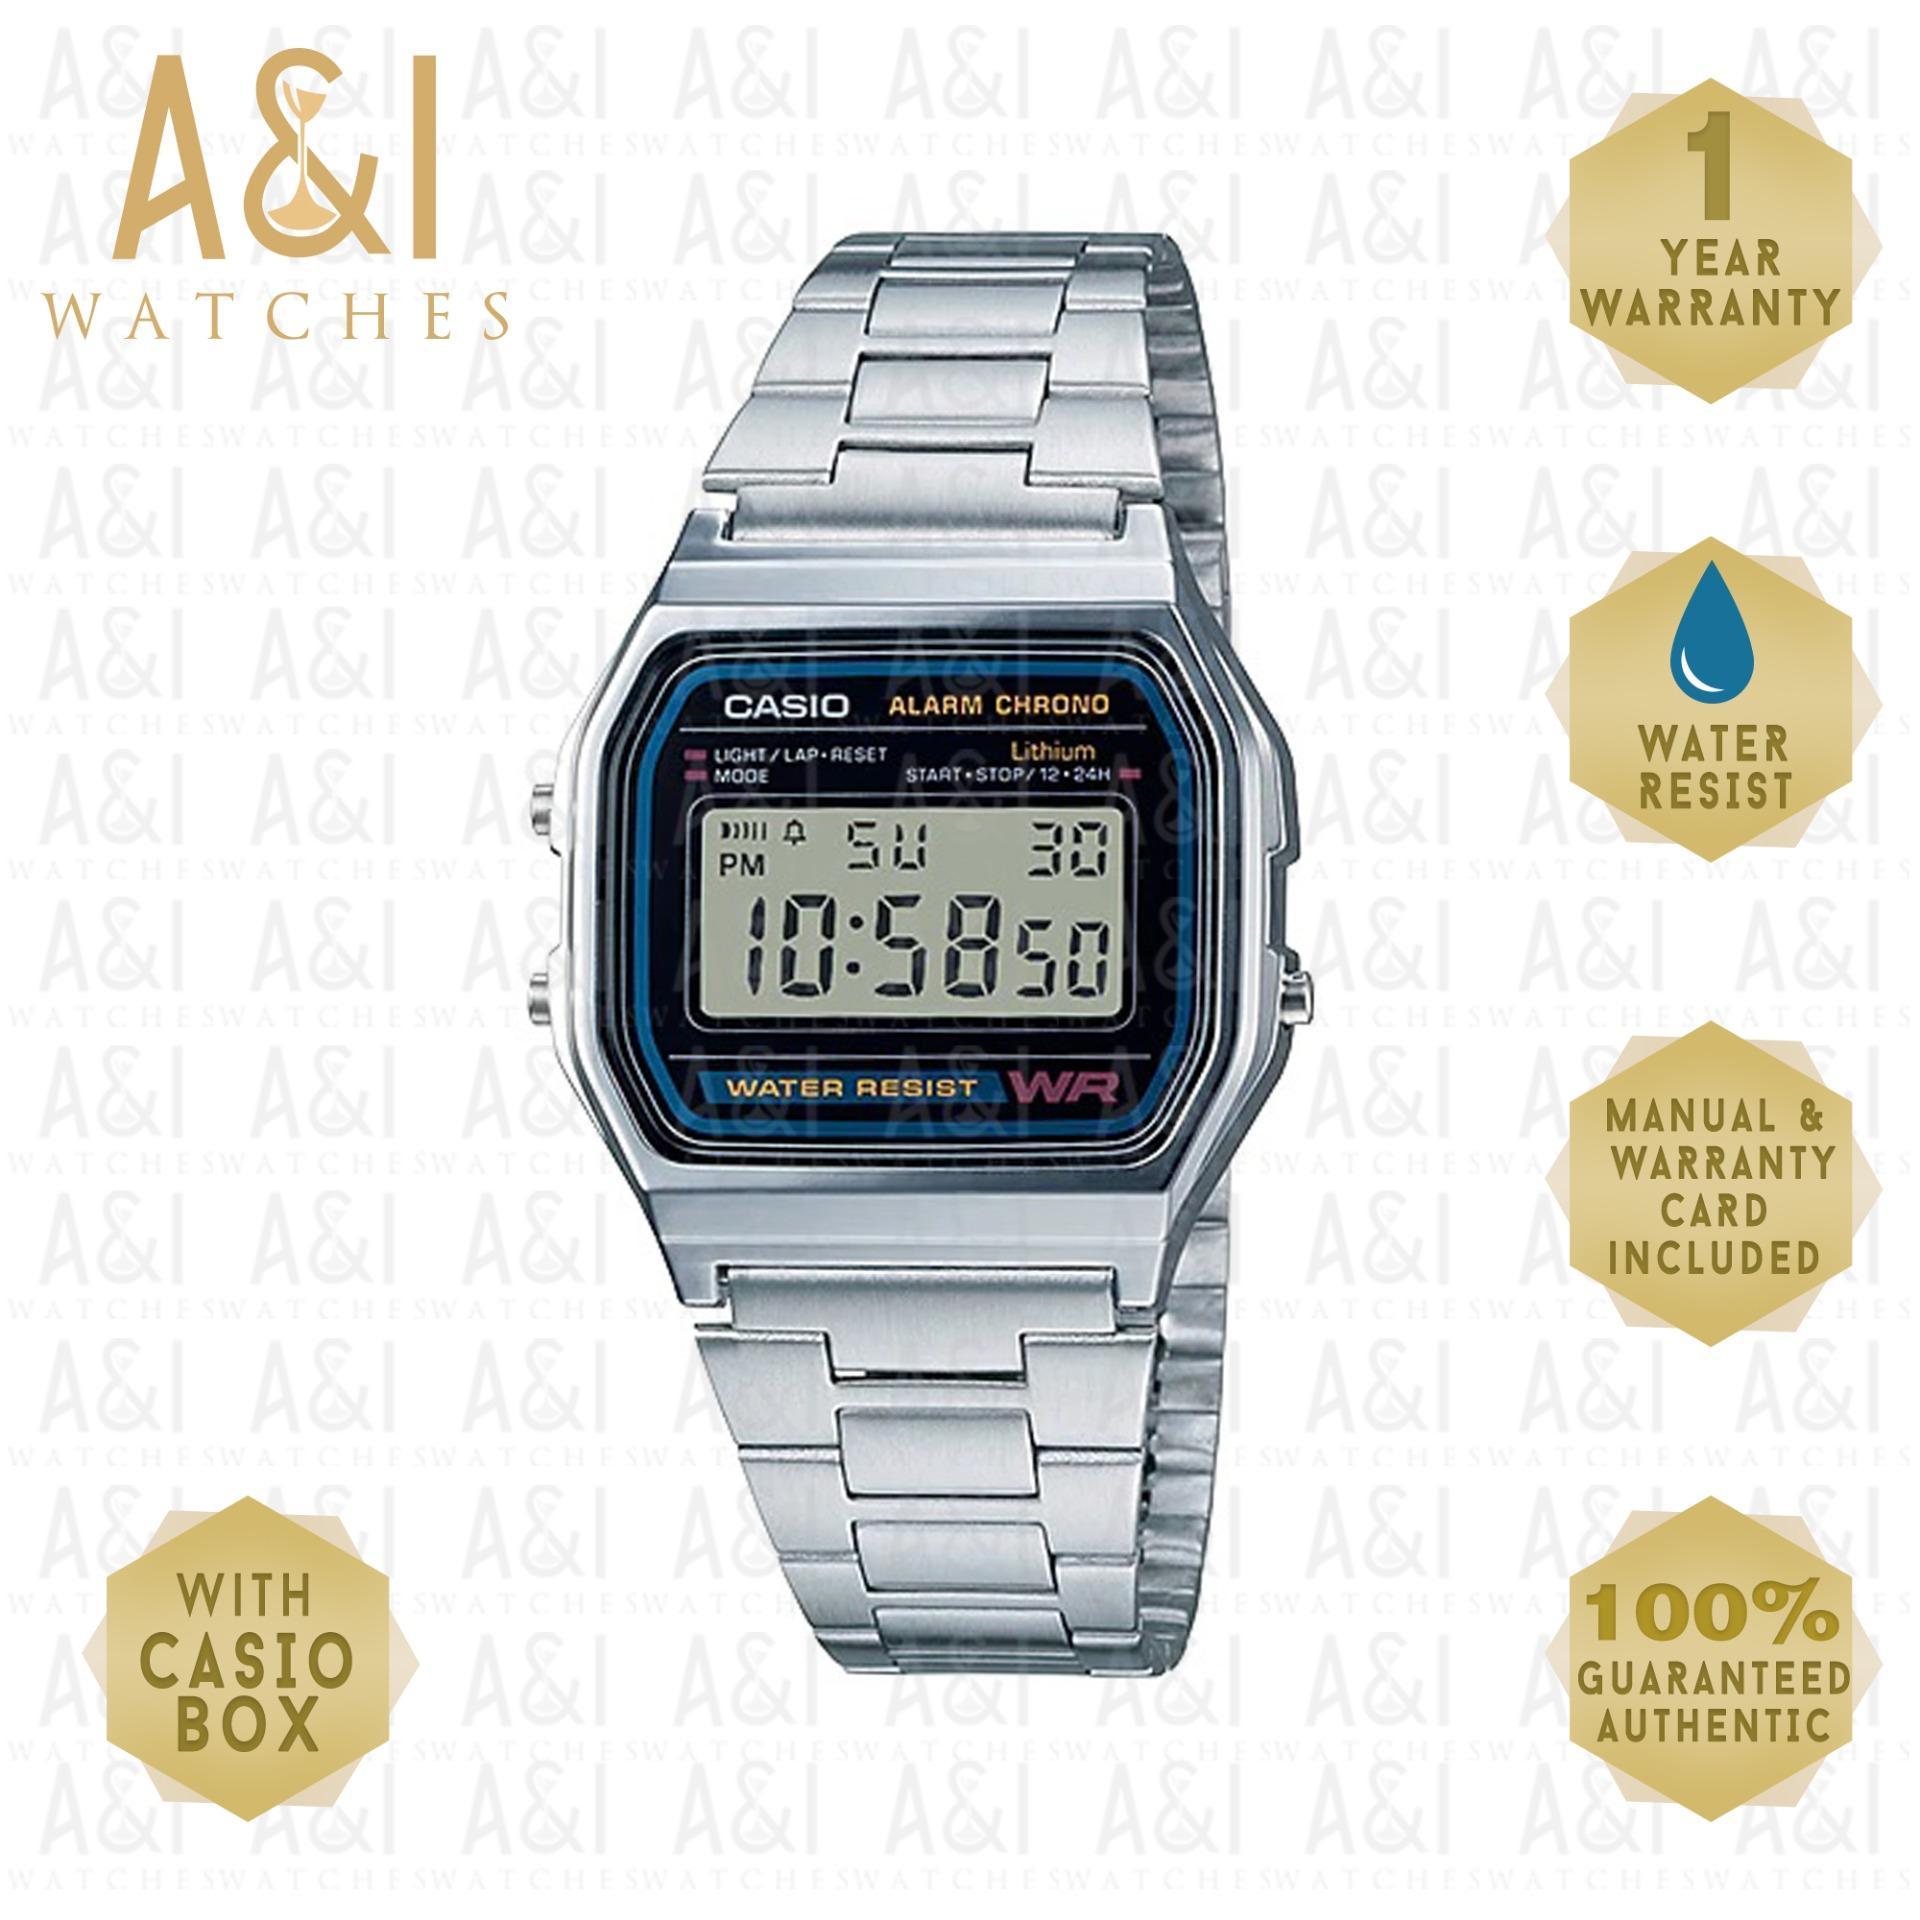 Casio Philippines Watches For Women Sale Prices Jam Tangan Wanita Aw 48he 1avdf Original Vintage Silver A158wa 1df 1yr Warranty